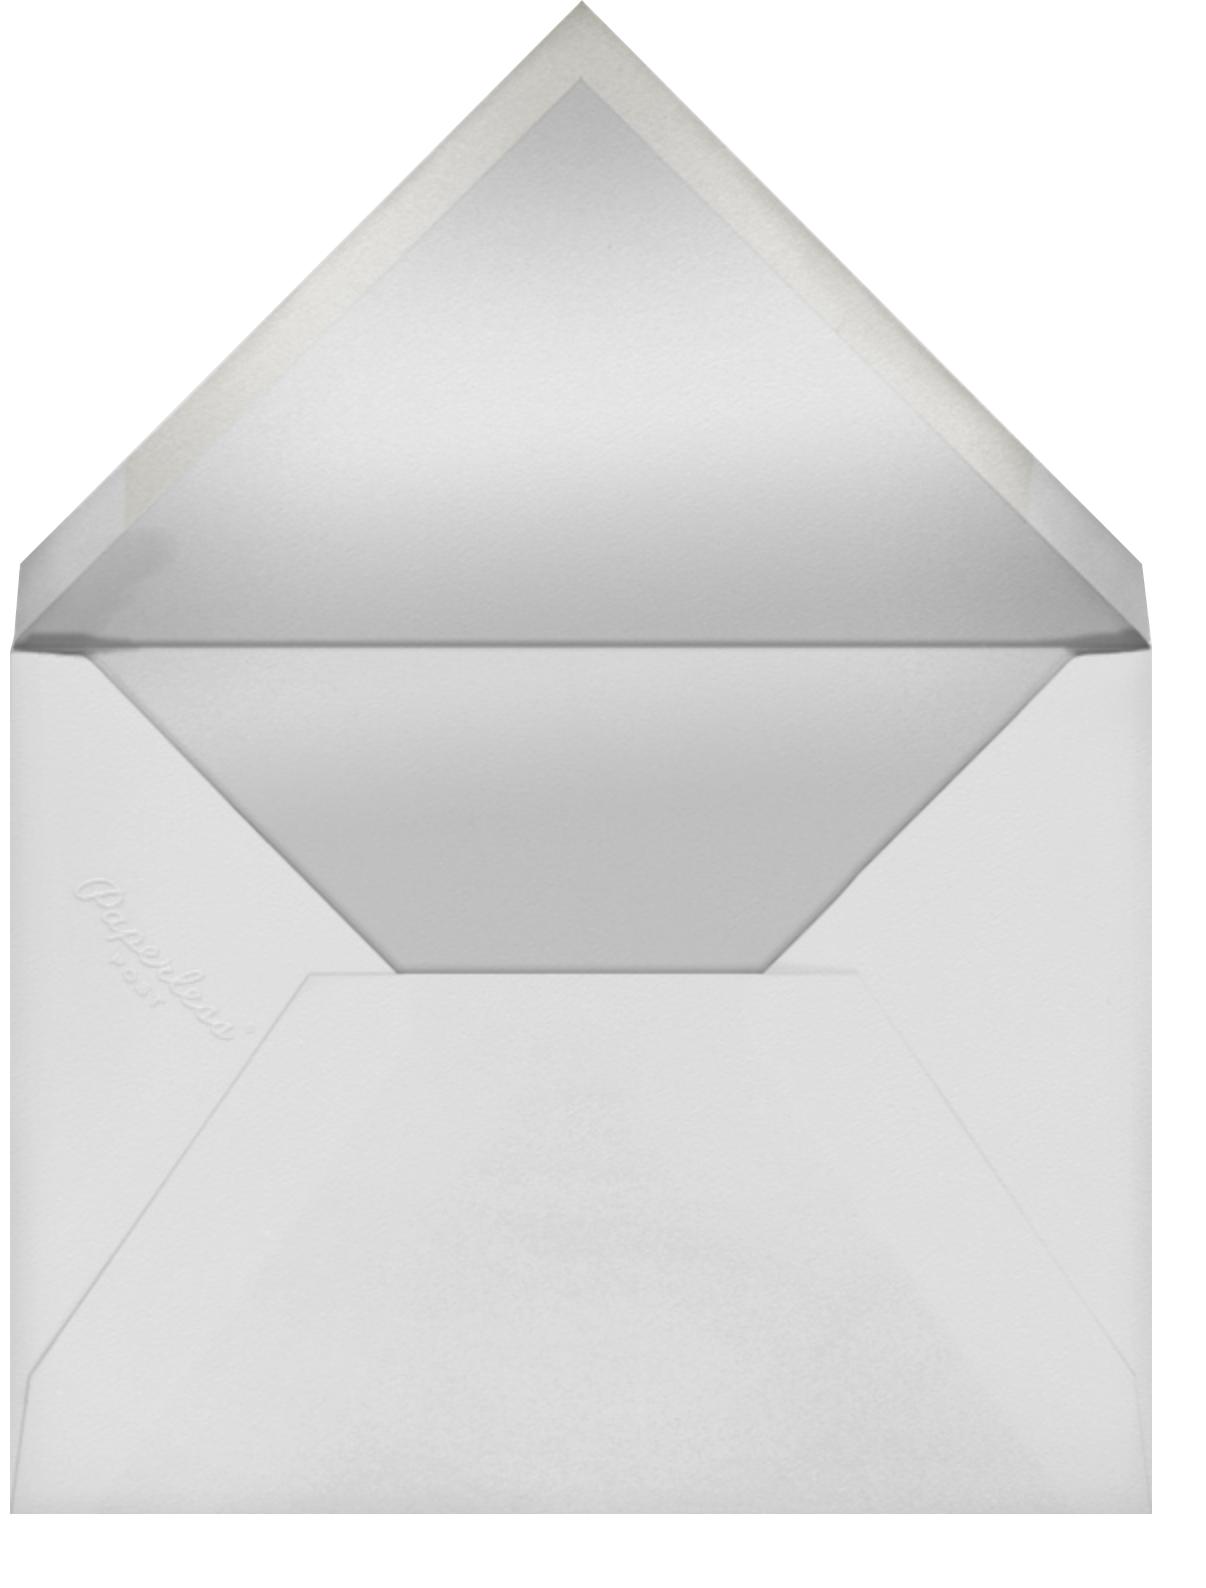 Mirabell (Program) - Green - Linda and Harriett - Menus and programs - envelope back